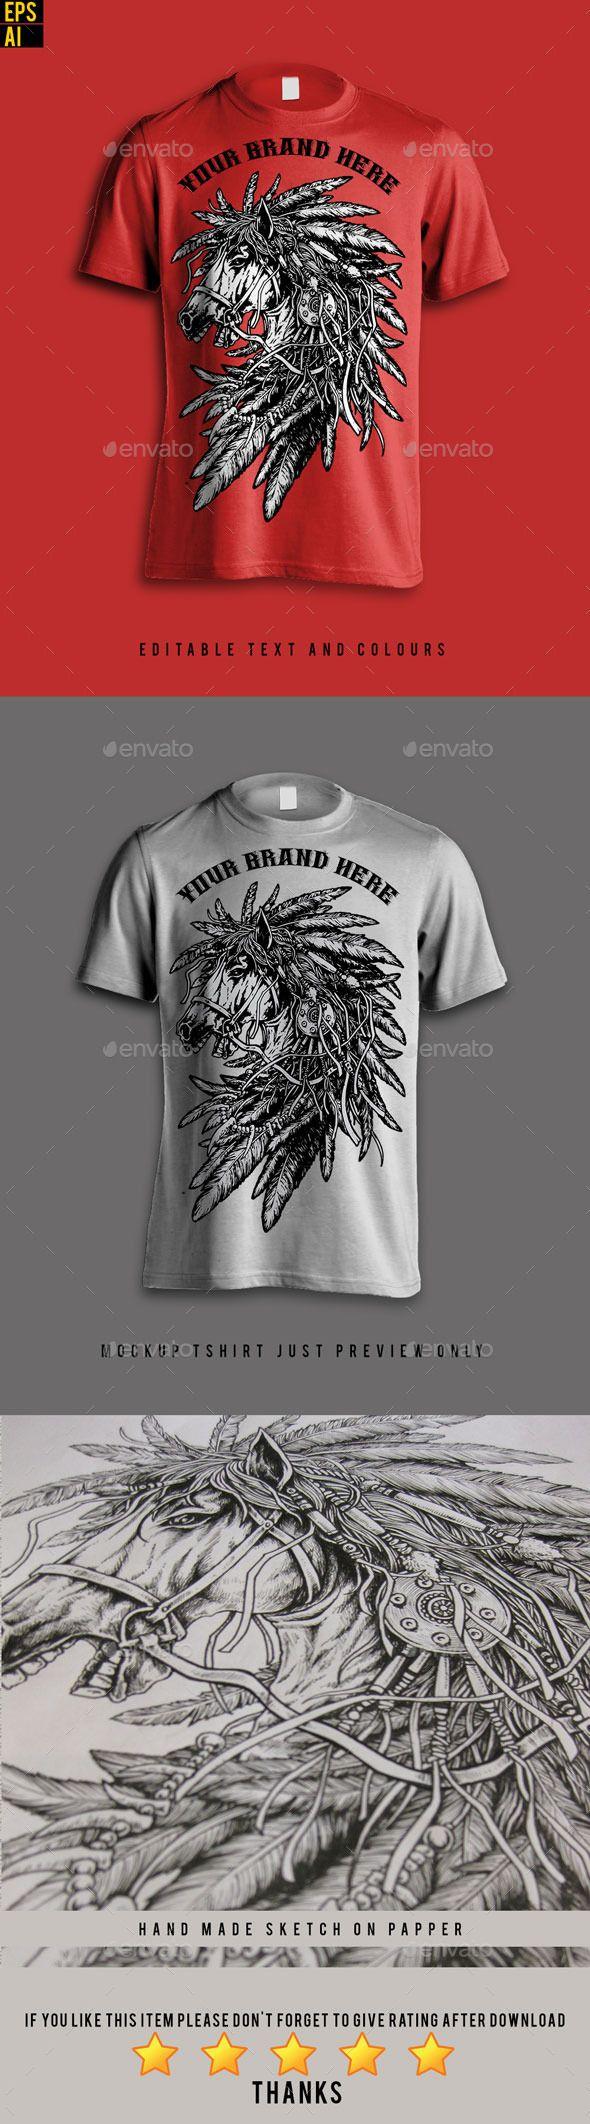 T shirt design download - Design